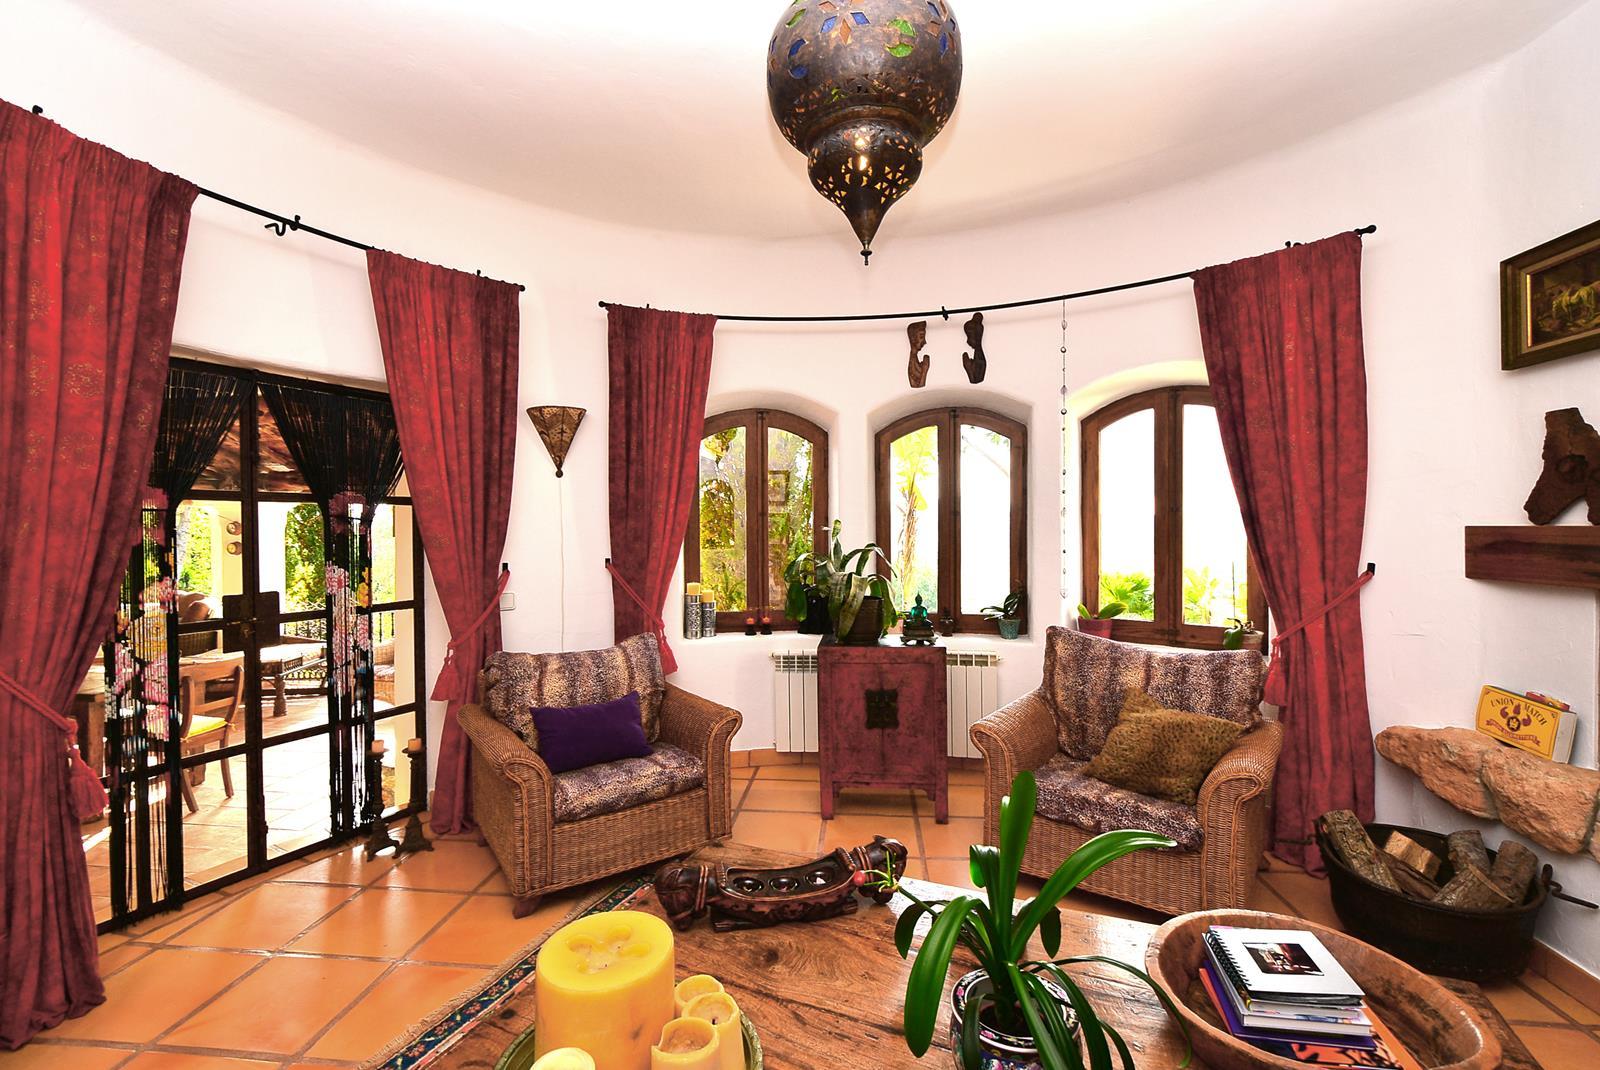 Very fine villa spanish finca type with an idyllic garden close to Atzaro